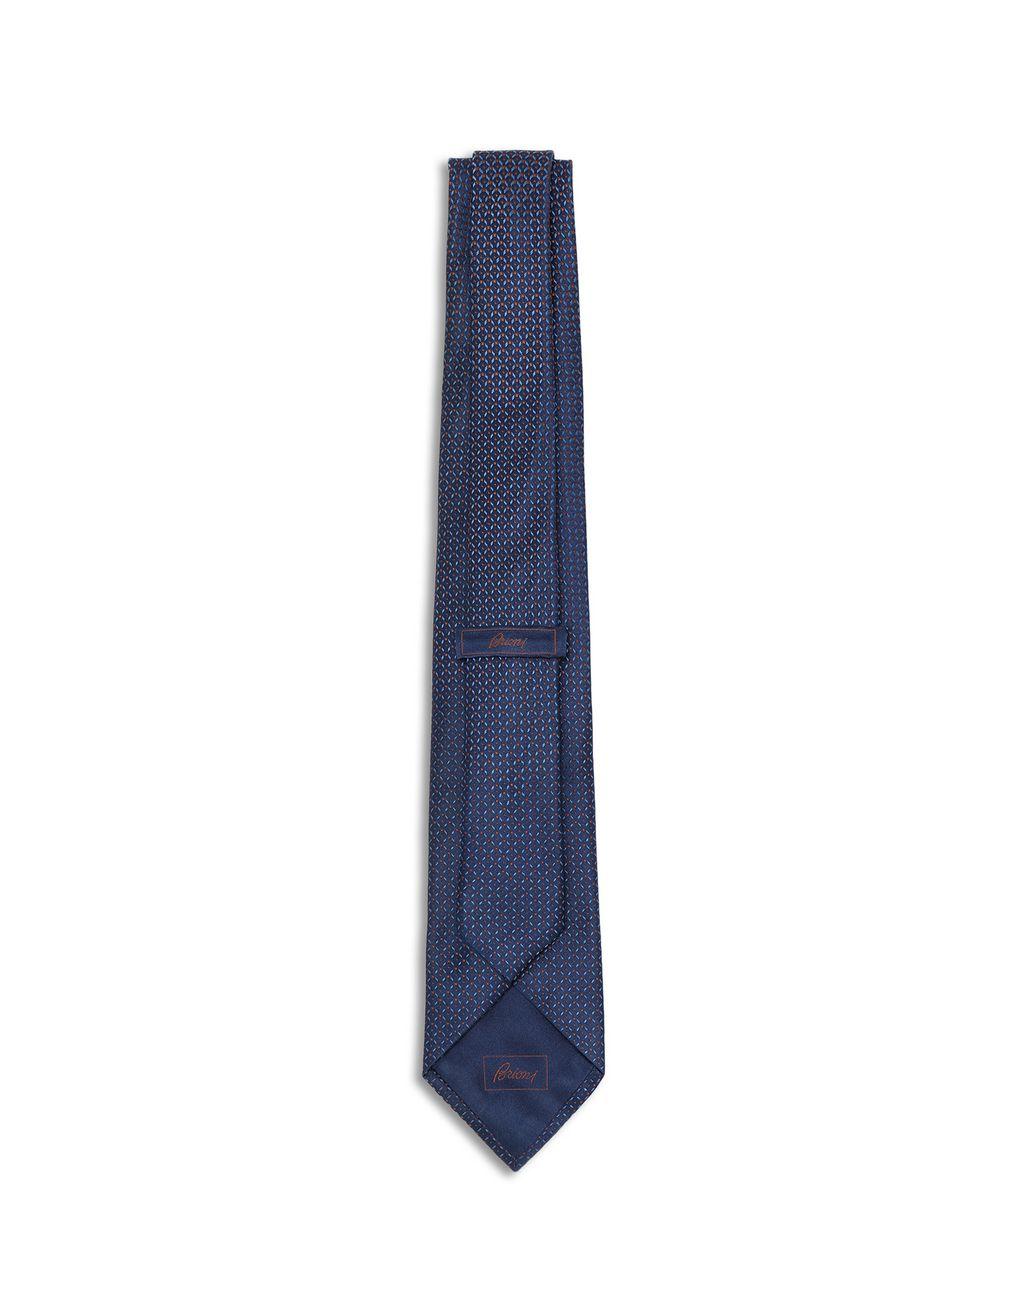 BRIONI Cravate en dégradé bleu à motif Cravate [*** pickupInStoreShippingNotGuaranteed_info ***] r